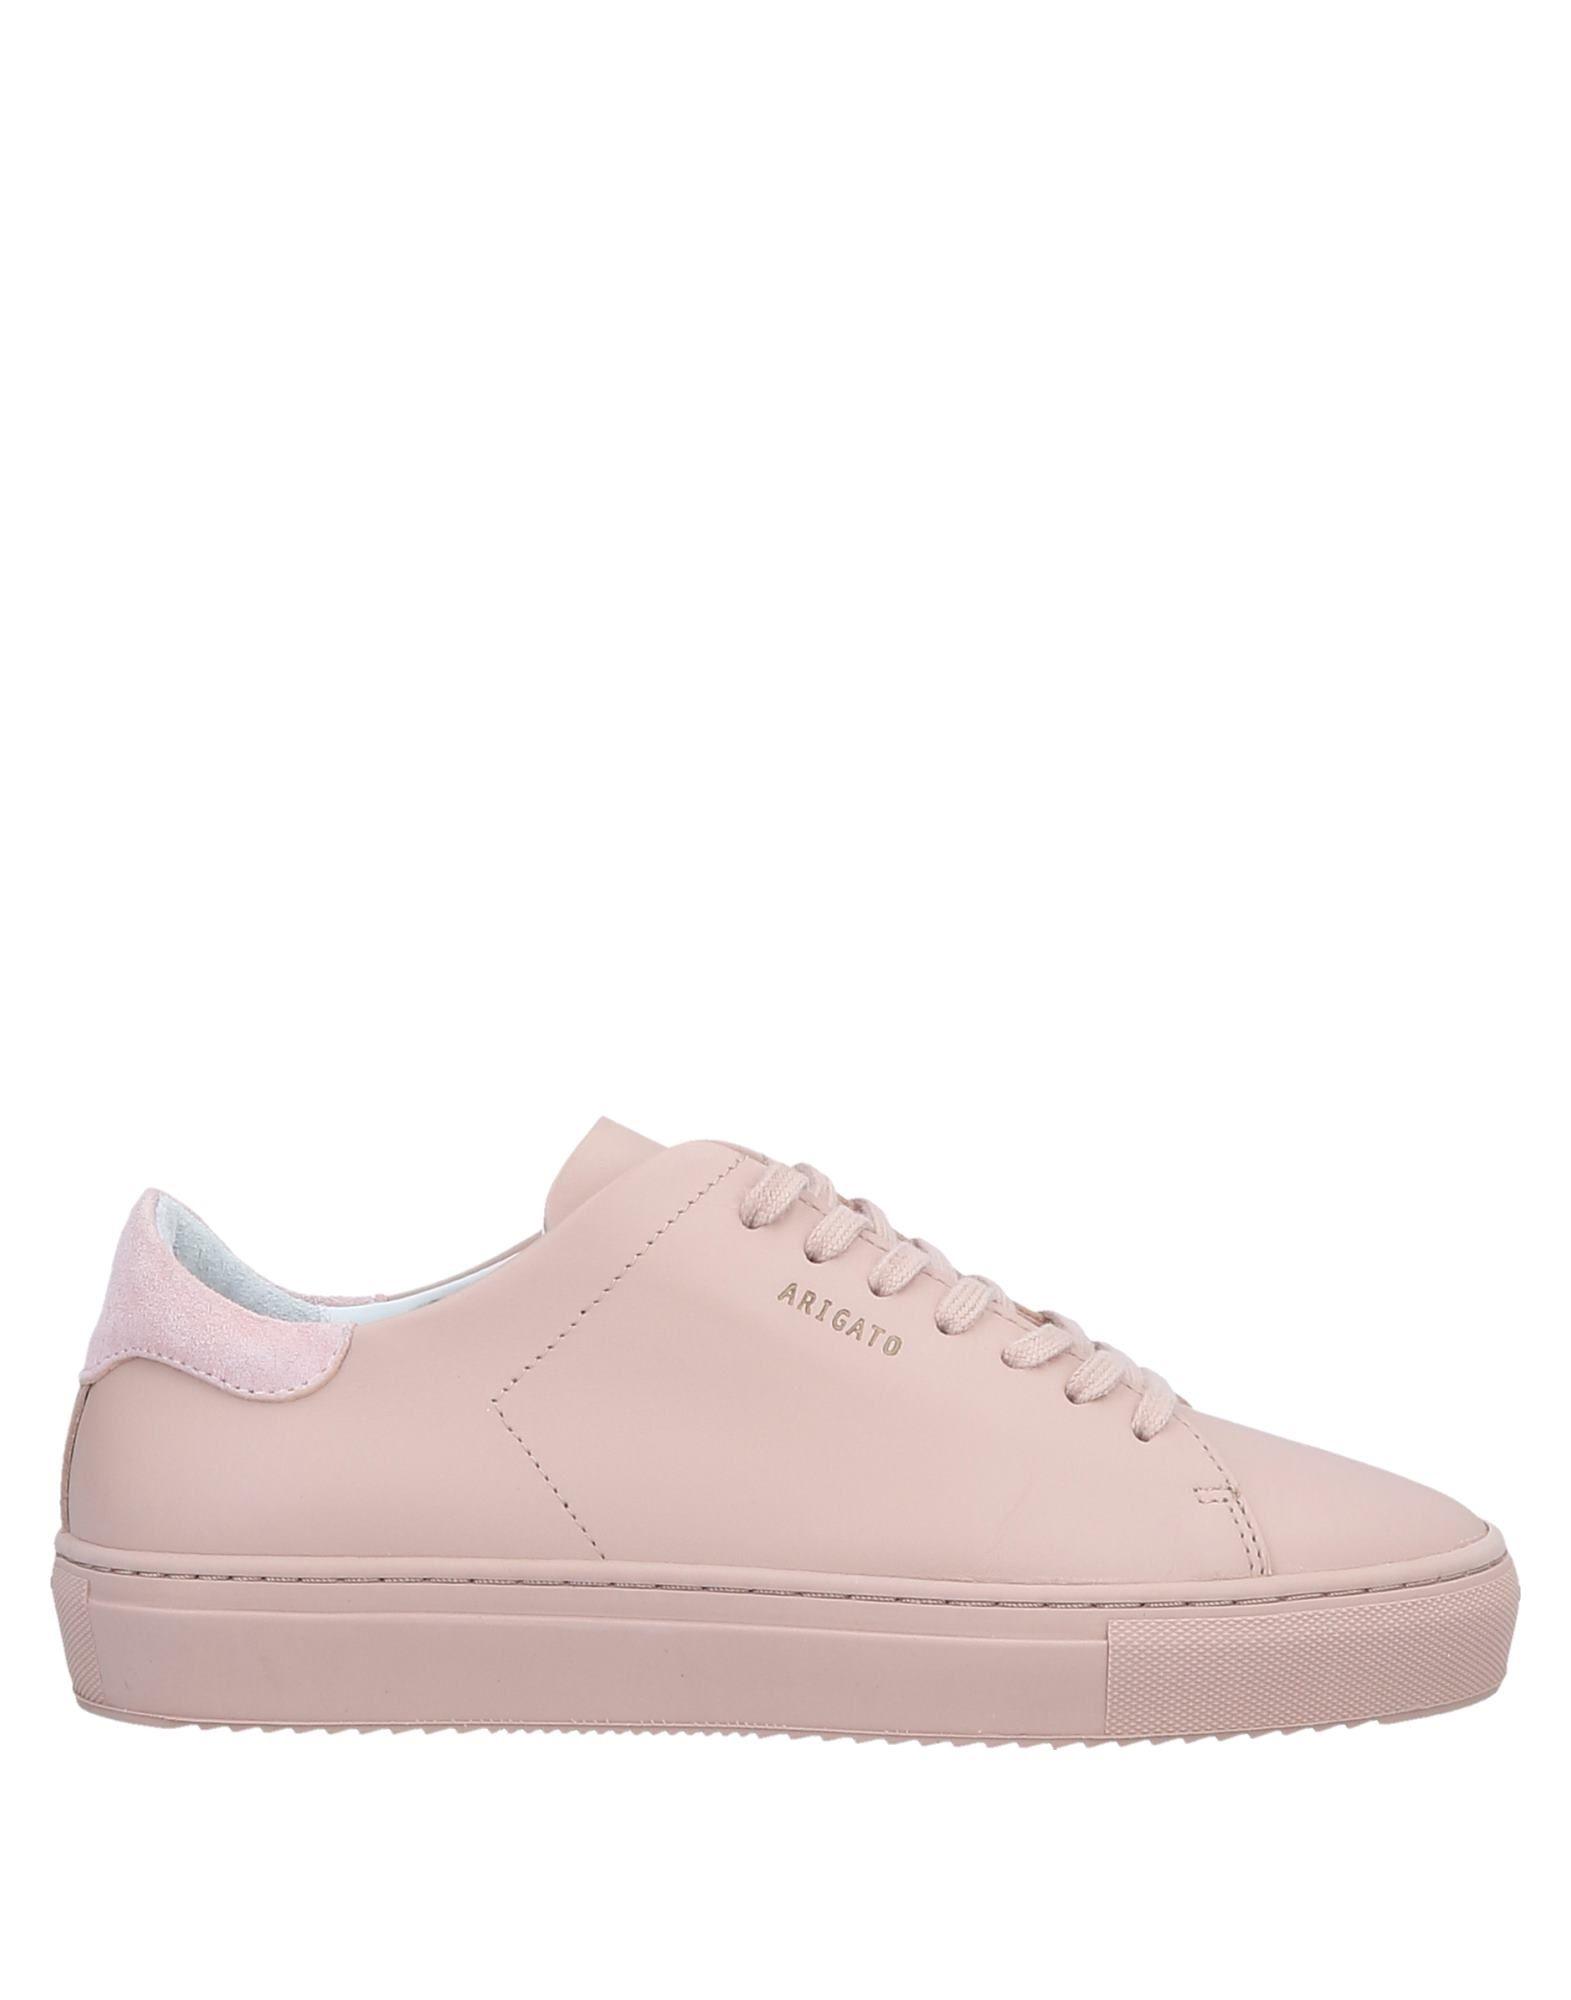 Axel Arigato Sneakers - Women on Axel Arigato Sneakers online on Women  United Kingdom - 11556386UG 1472c2